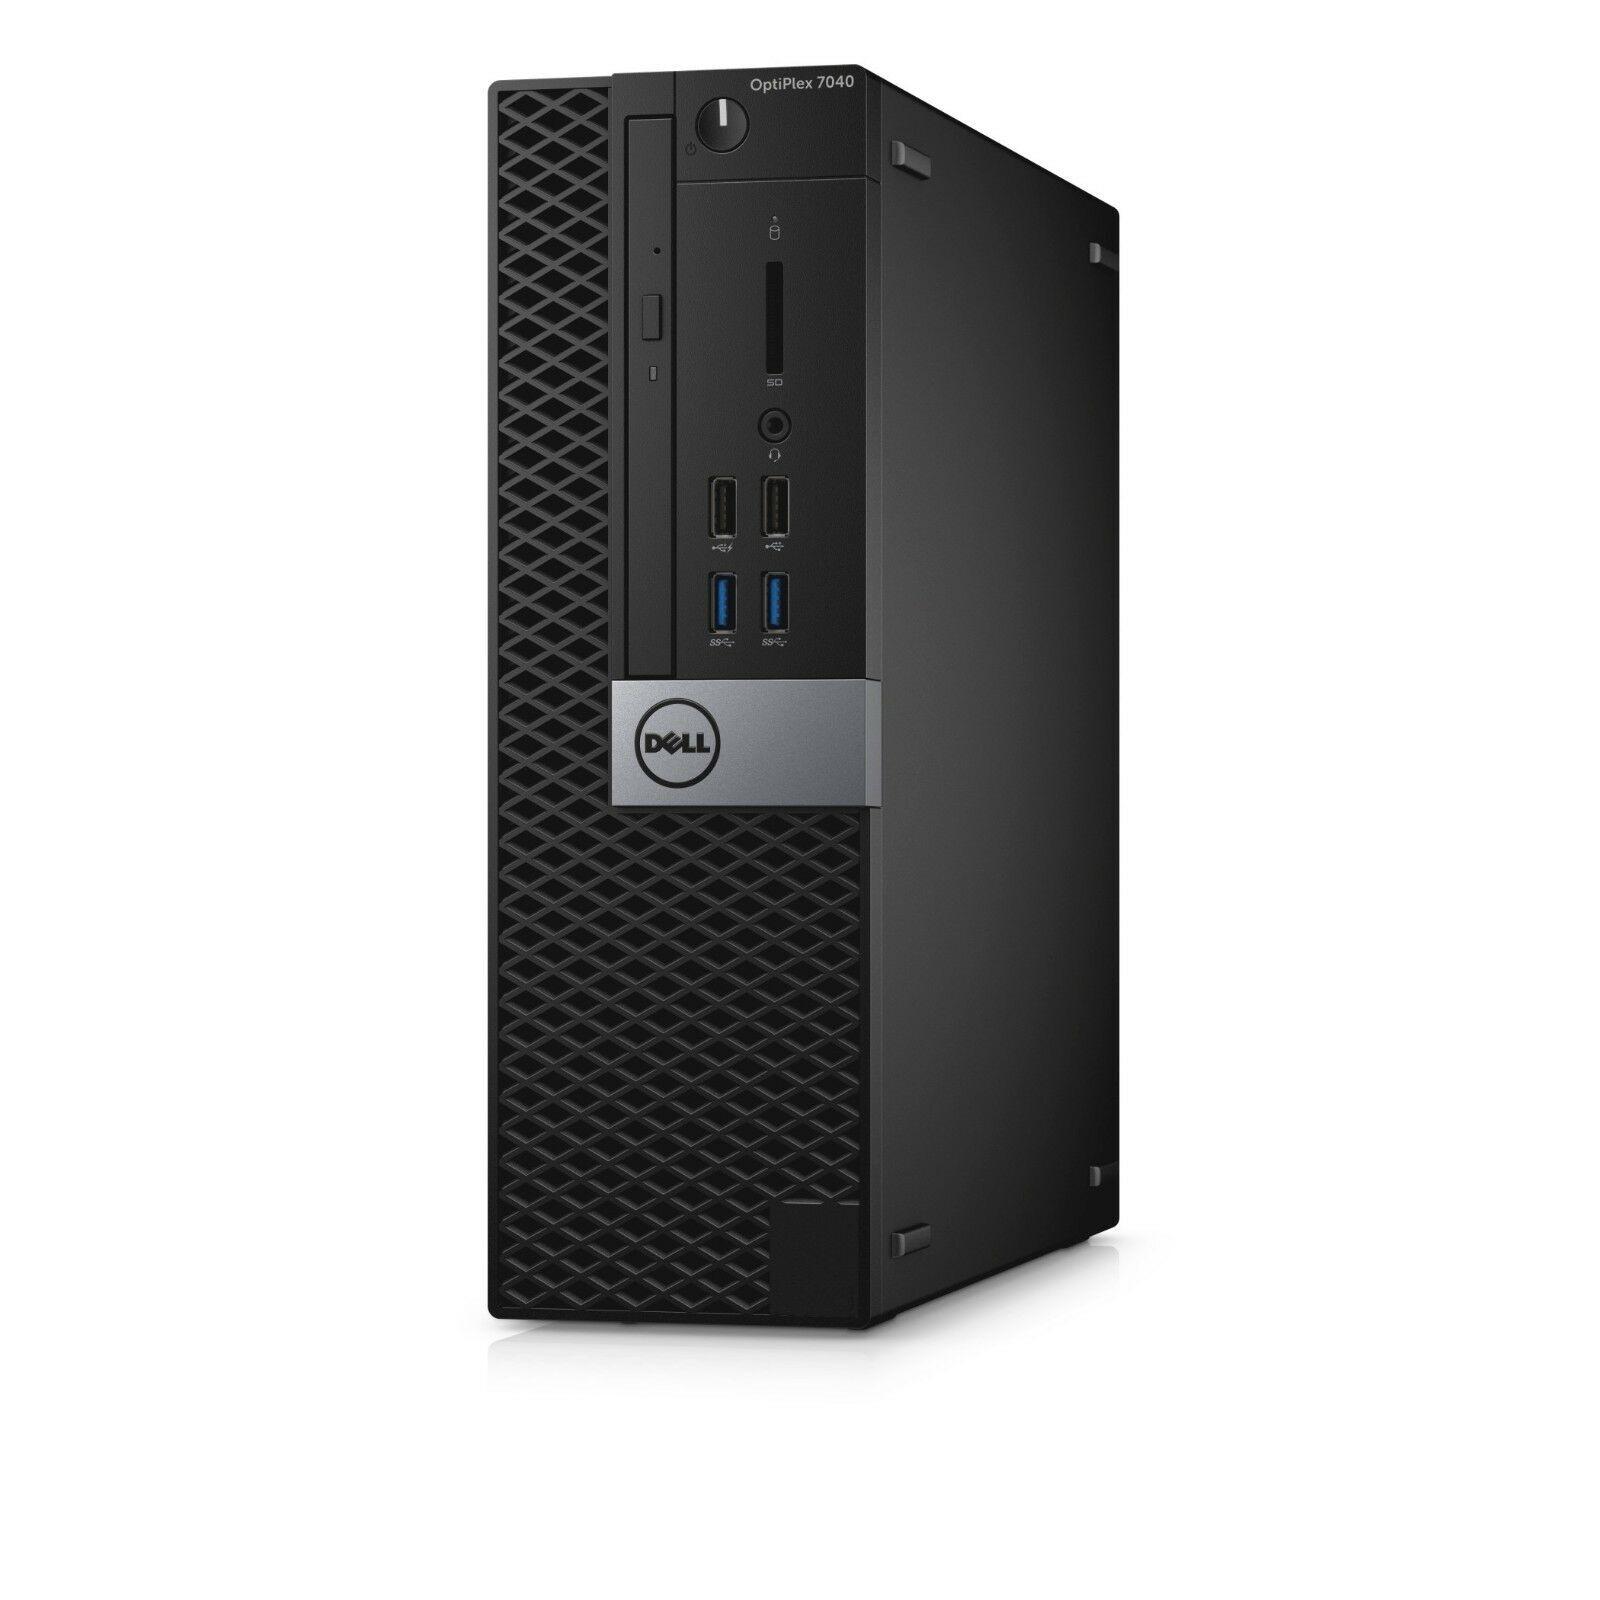 Dell Optiplex 7040 SFF Intel i5 6500 3.2Ghz 8Gb Ram 500 HDD DVD HDMI Win 10